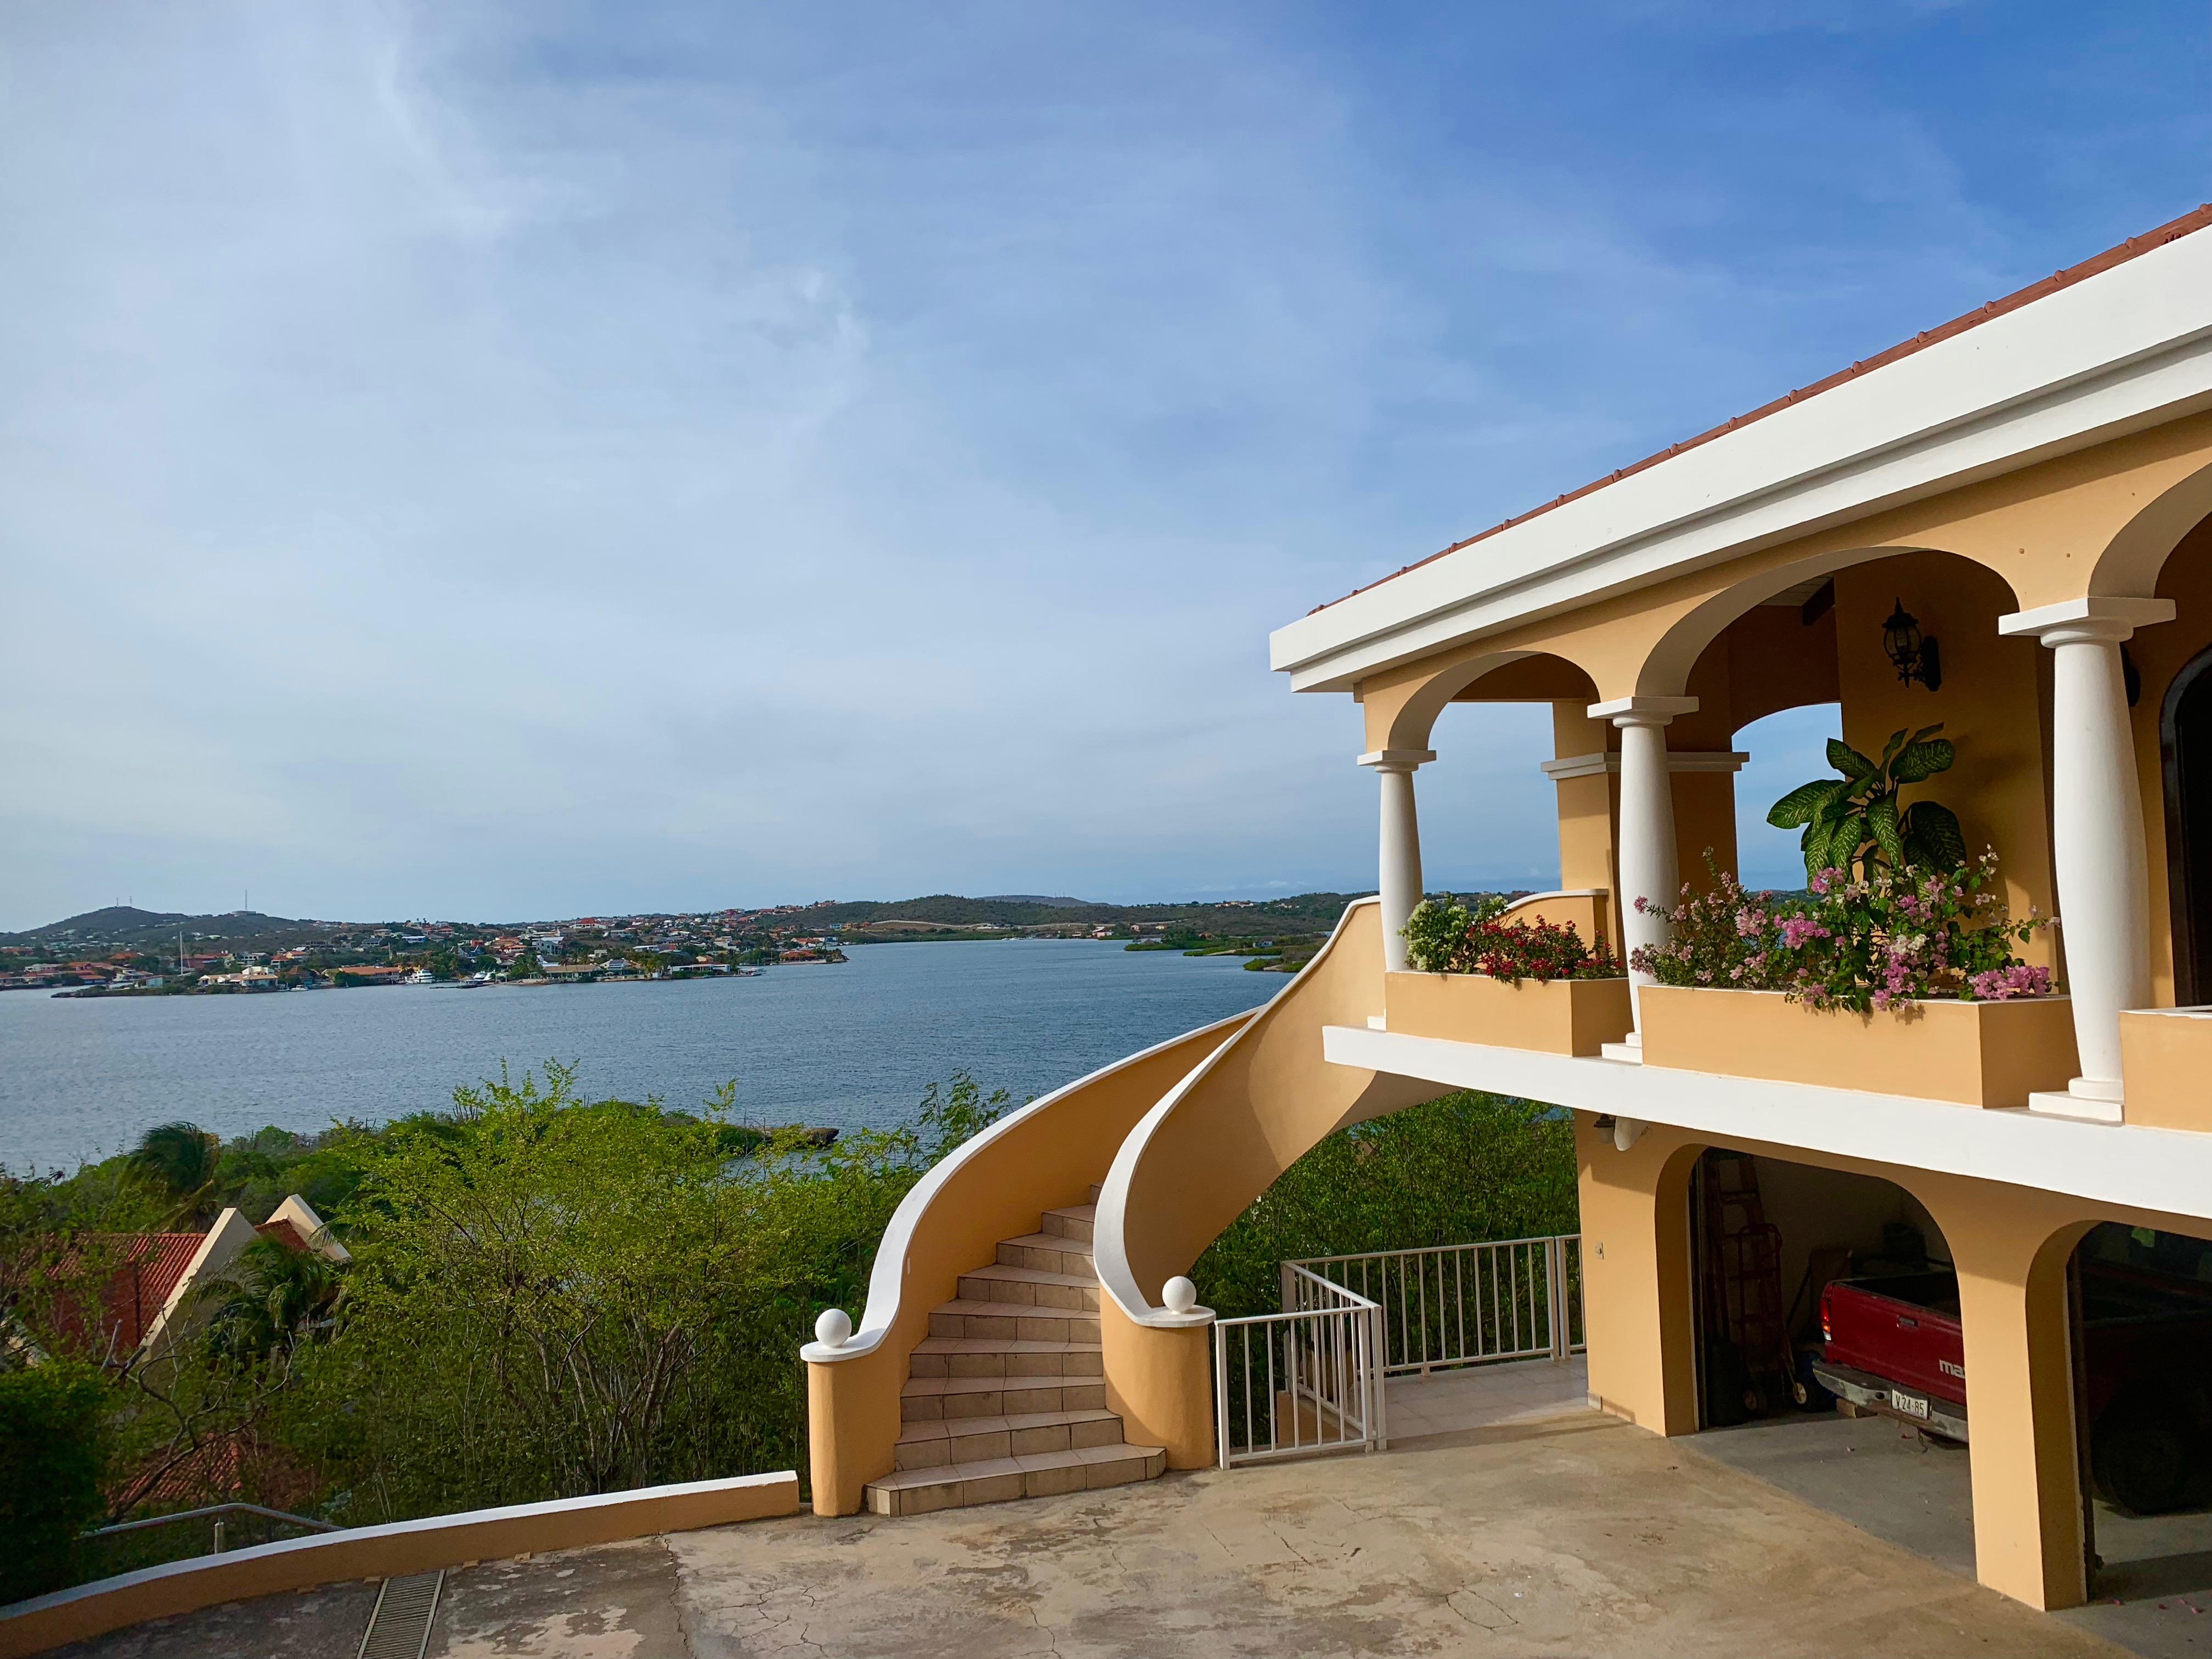 Curacao Architecture